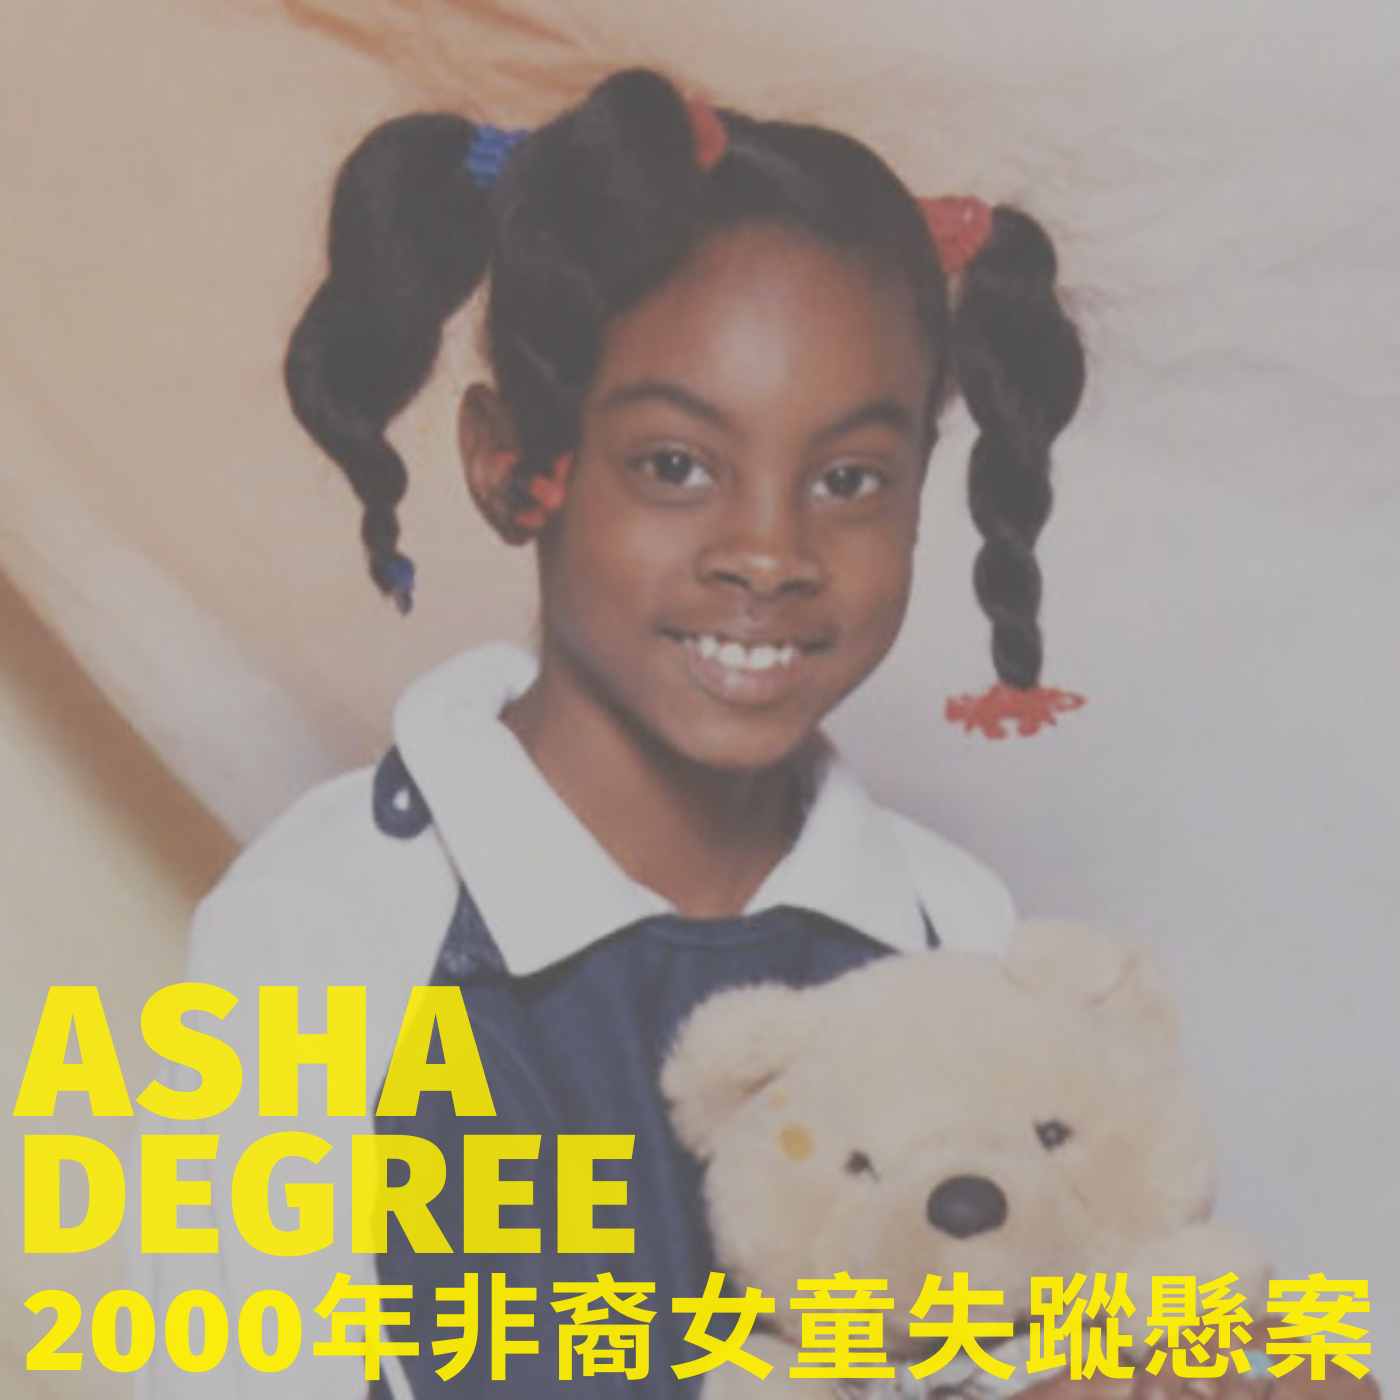 18.Asha Degree-暴風雨中消失的9歲女孩